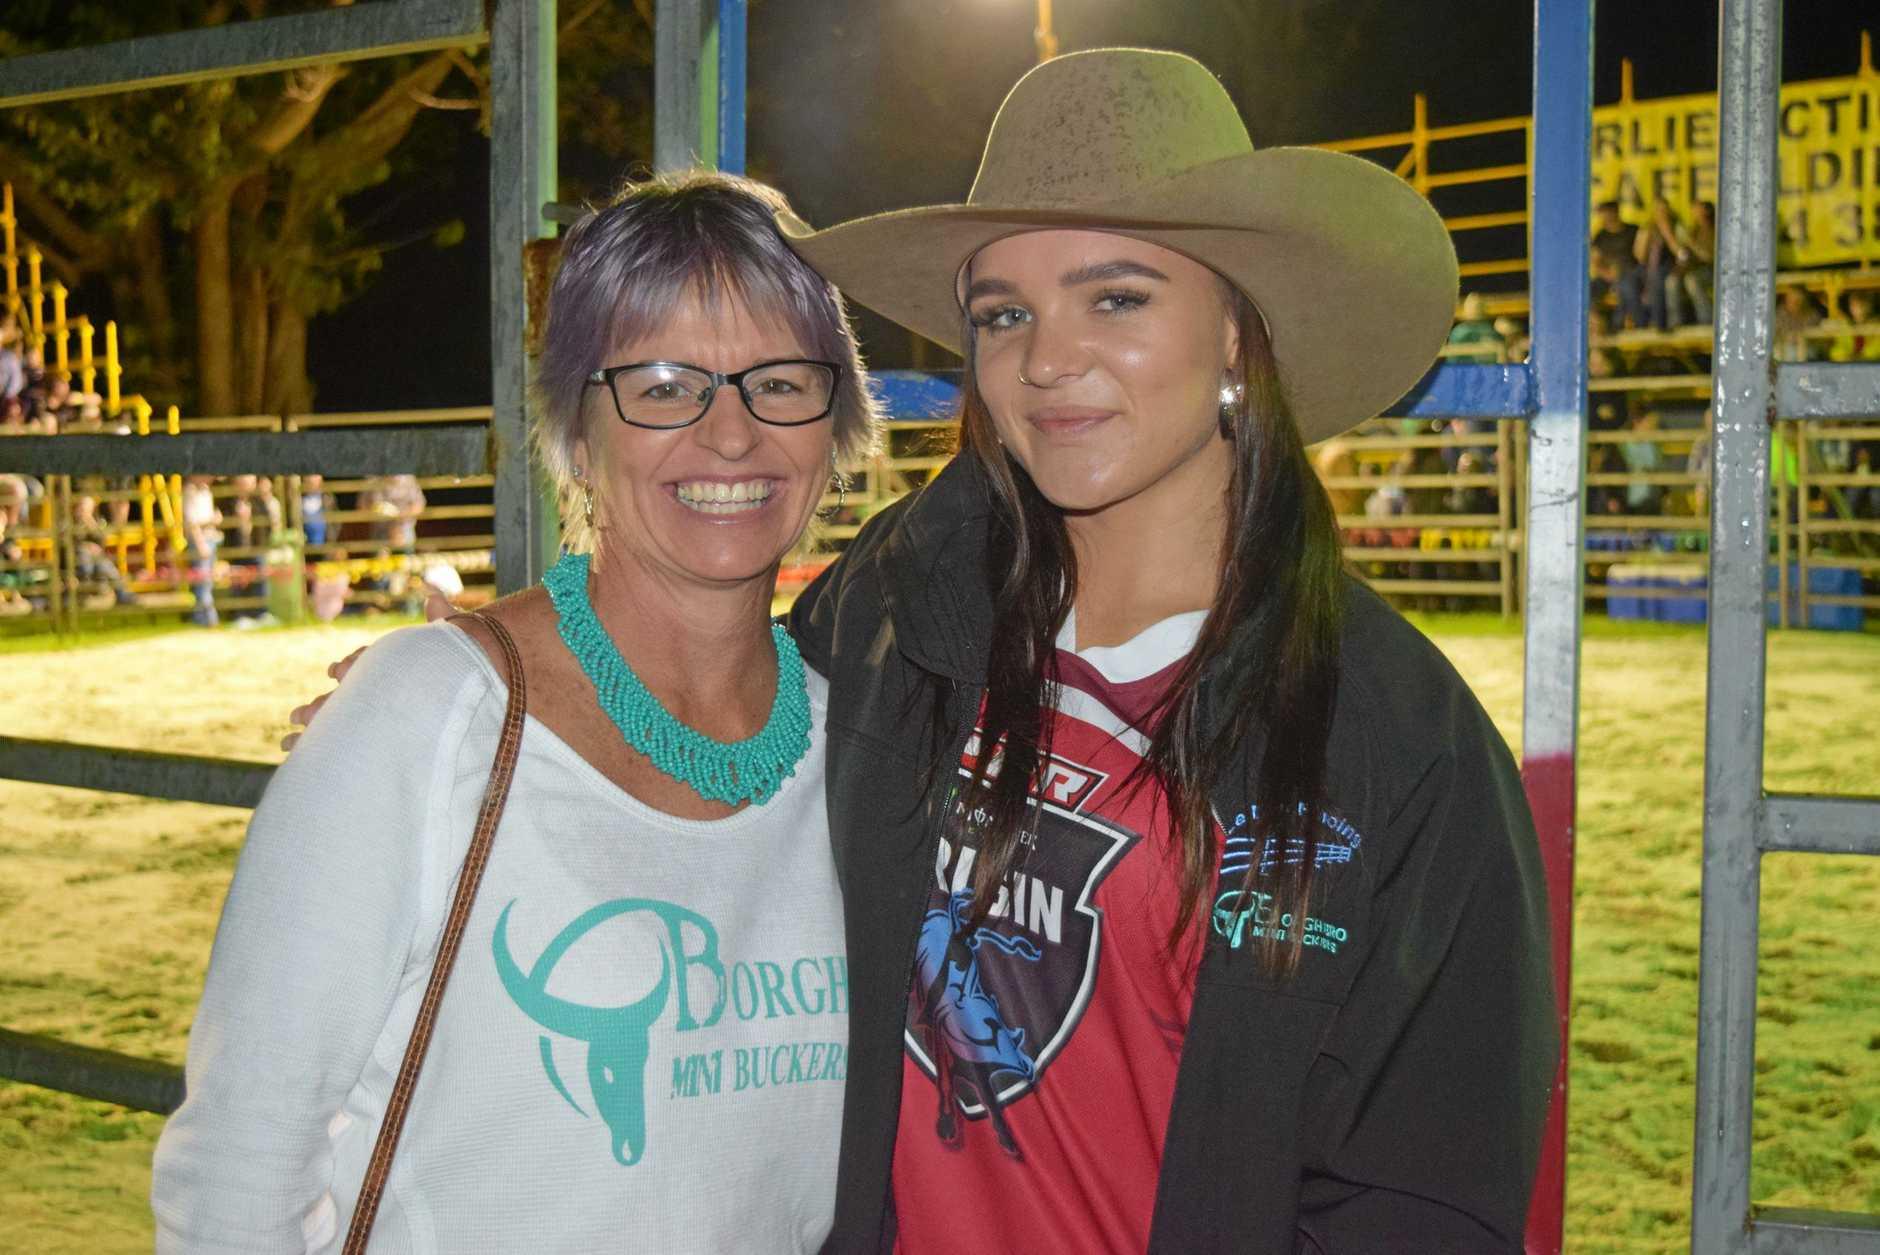 Leah Borghero and Dakota Brandenburg at the rodeo at the Jubilee Tavern and Proserpine Rodeo Association Bullarama on Saturday, July 6.